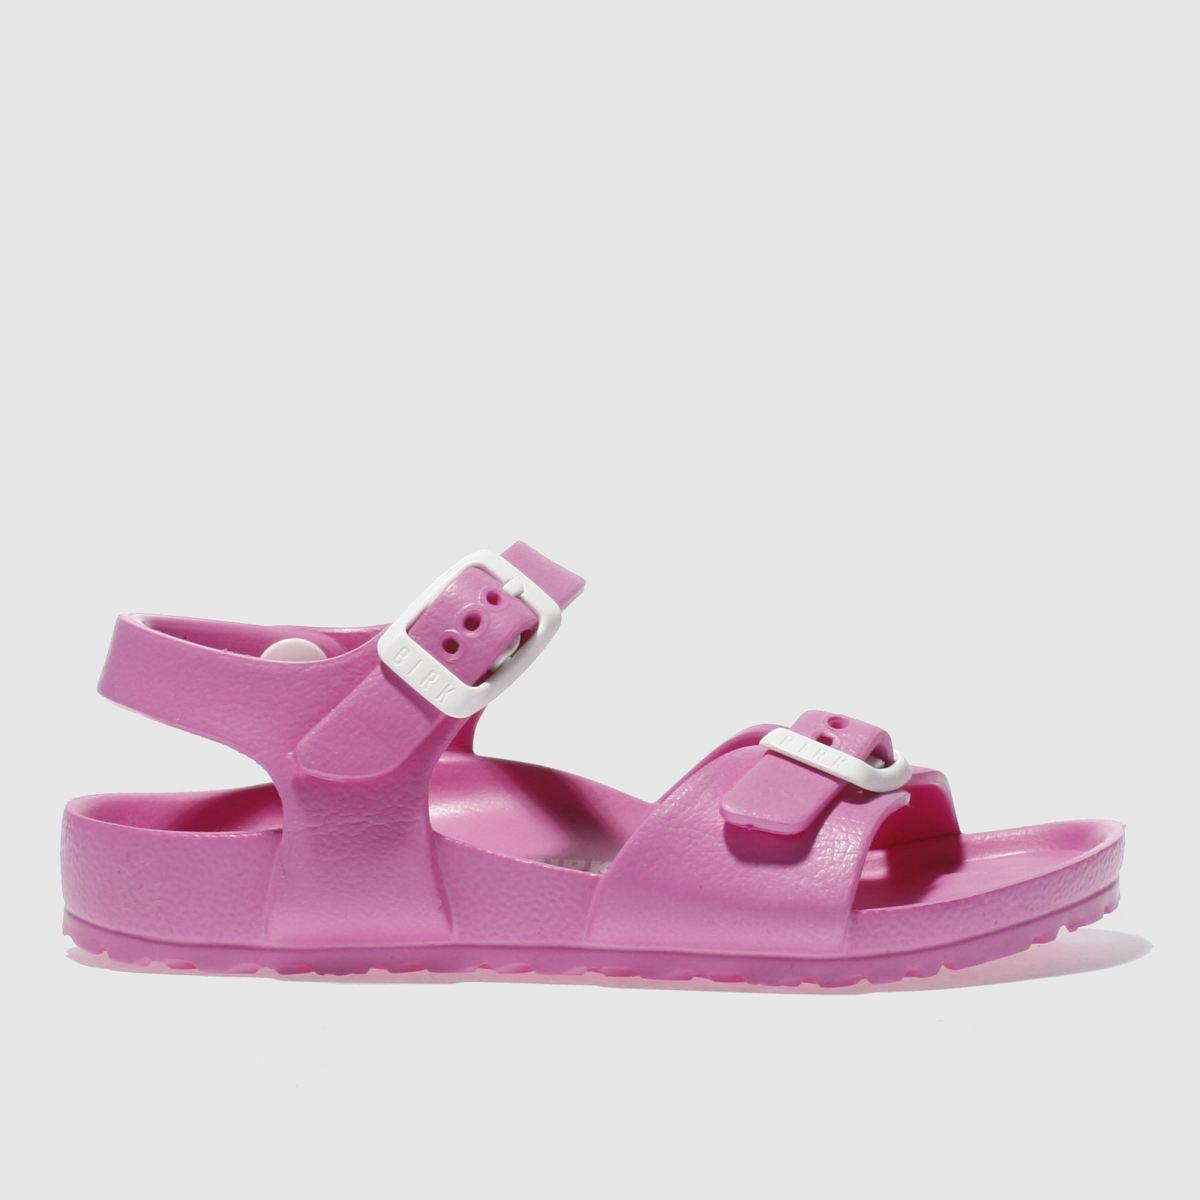 Birkenstock Pink Rio Eva Sandals Toddler